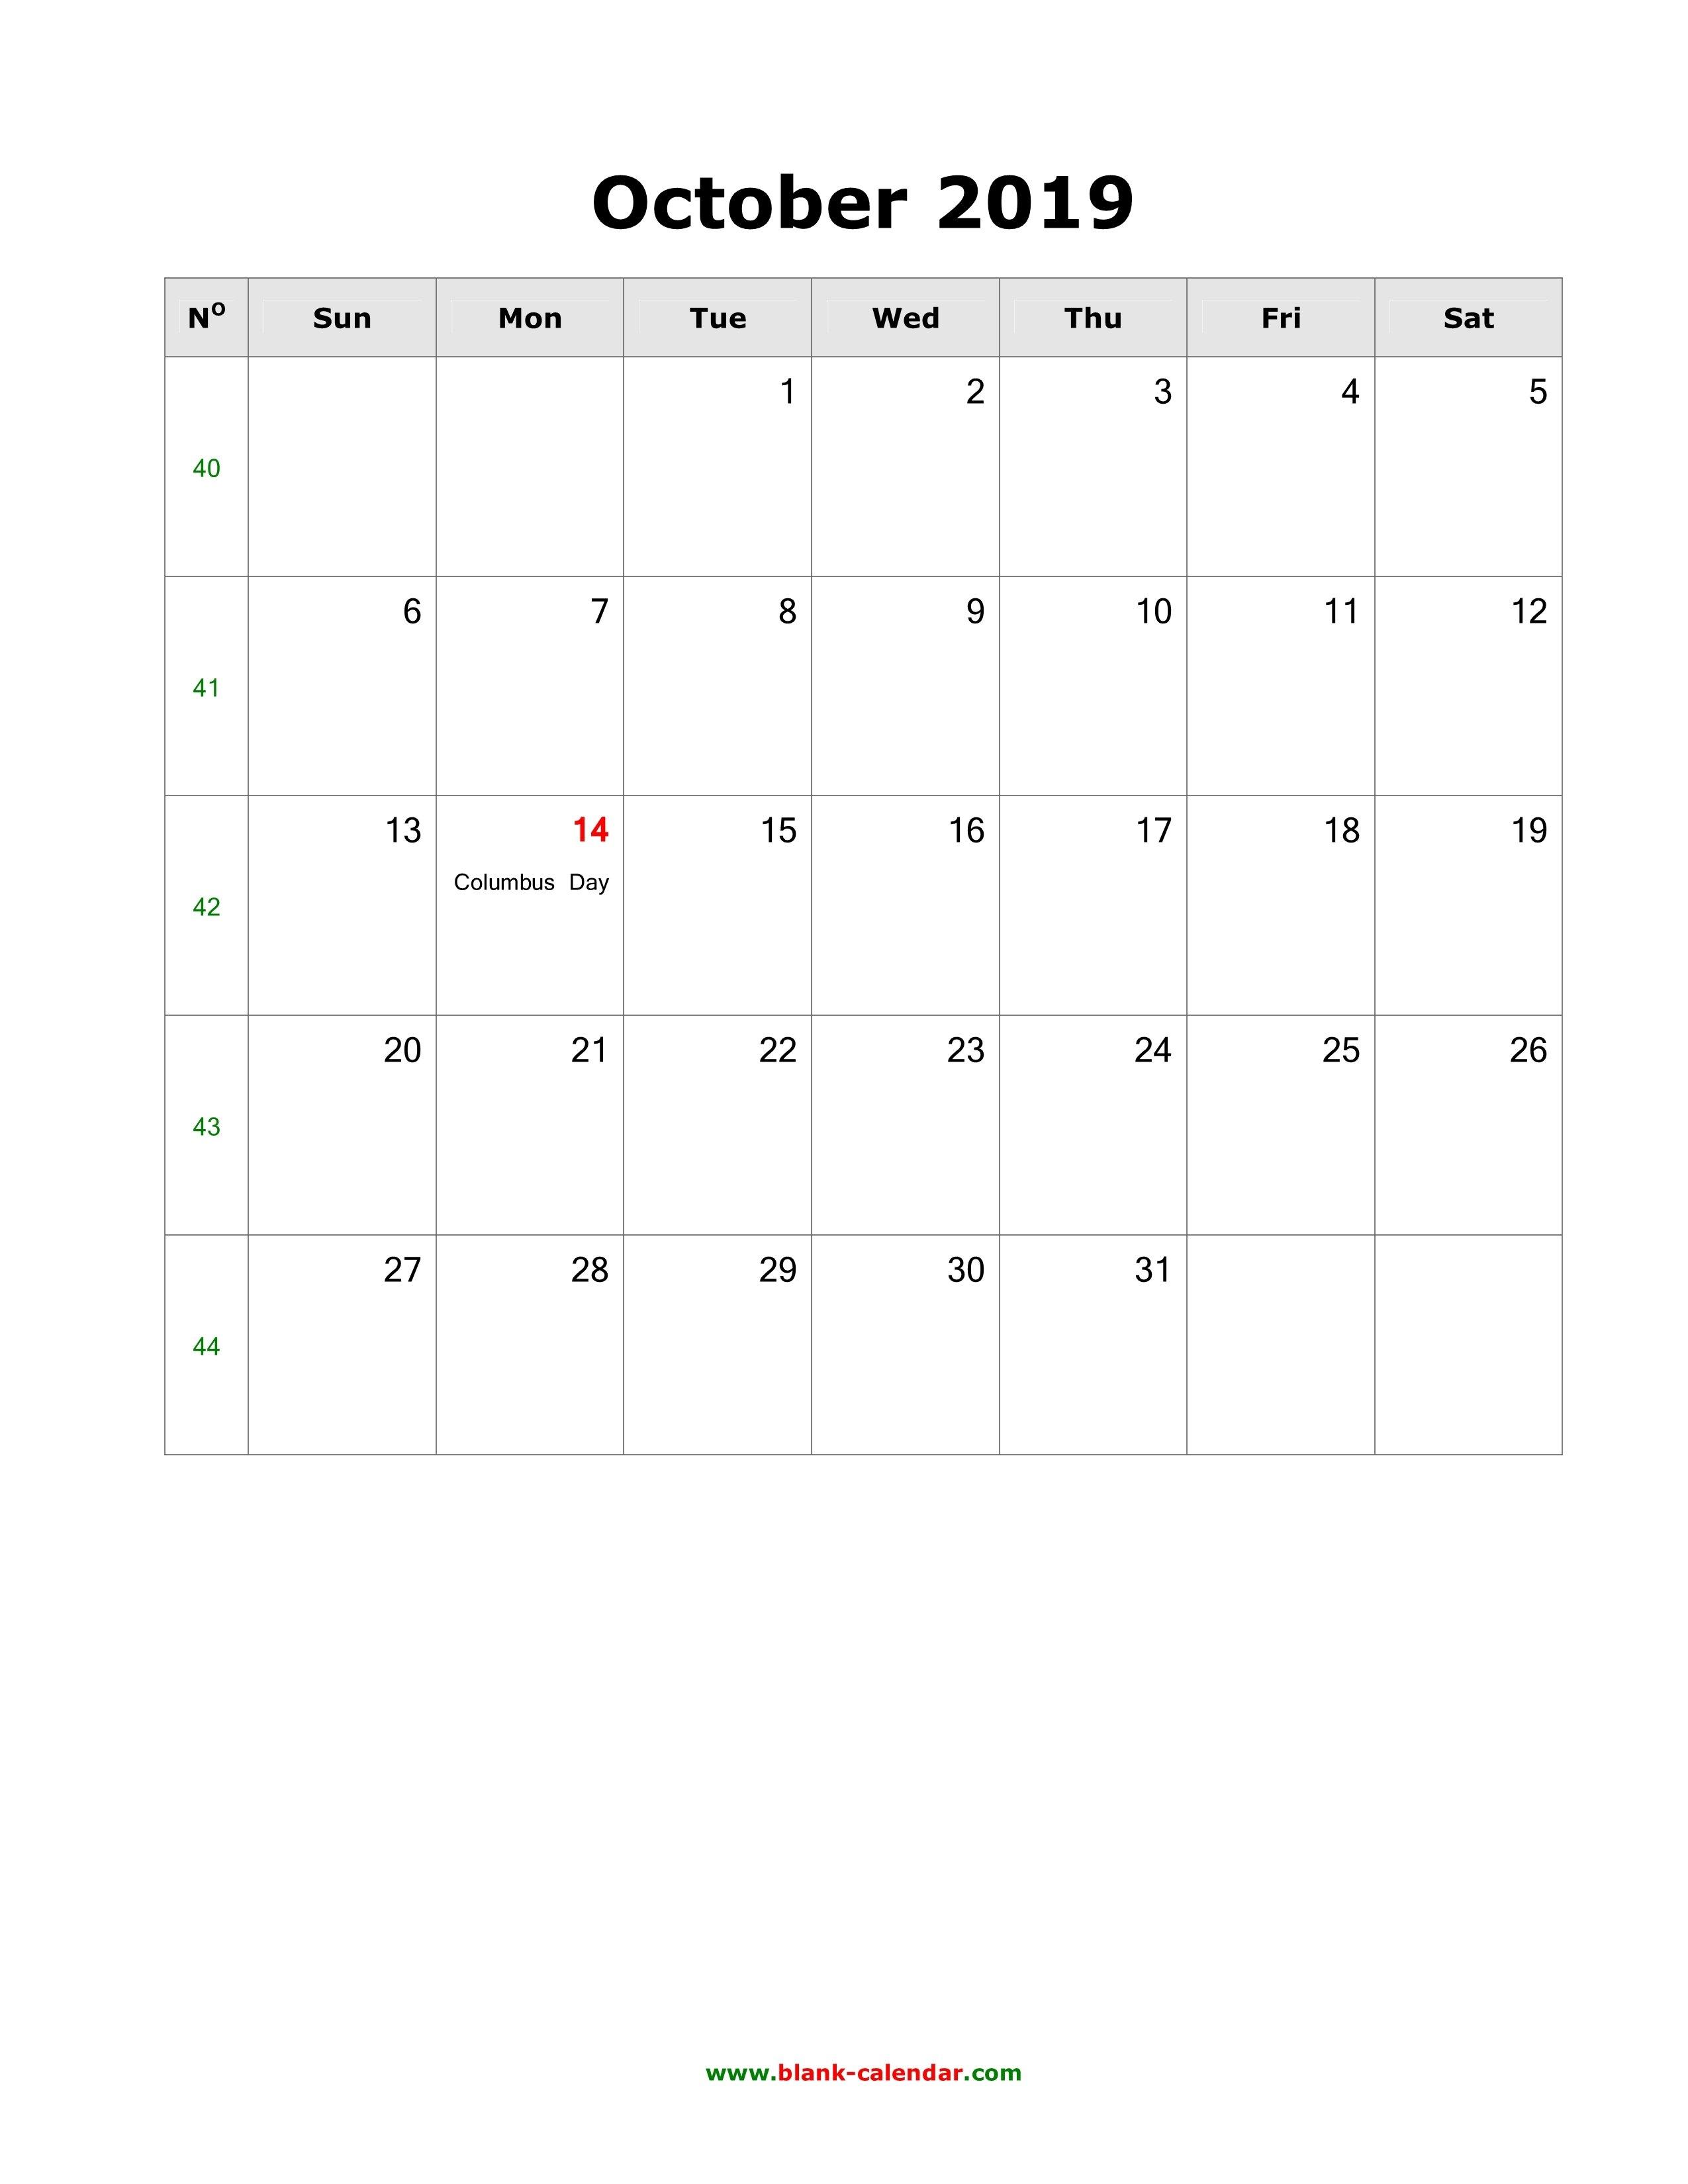 Download October 2019 Blank Calendar With Us Holidays (Vertical) Calendar 2019 Oct